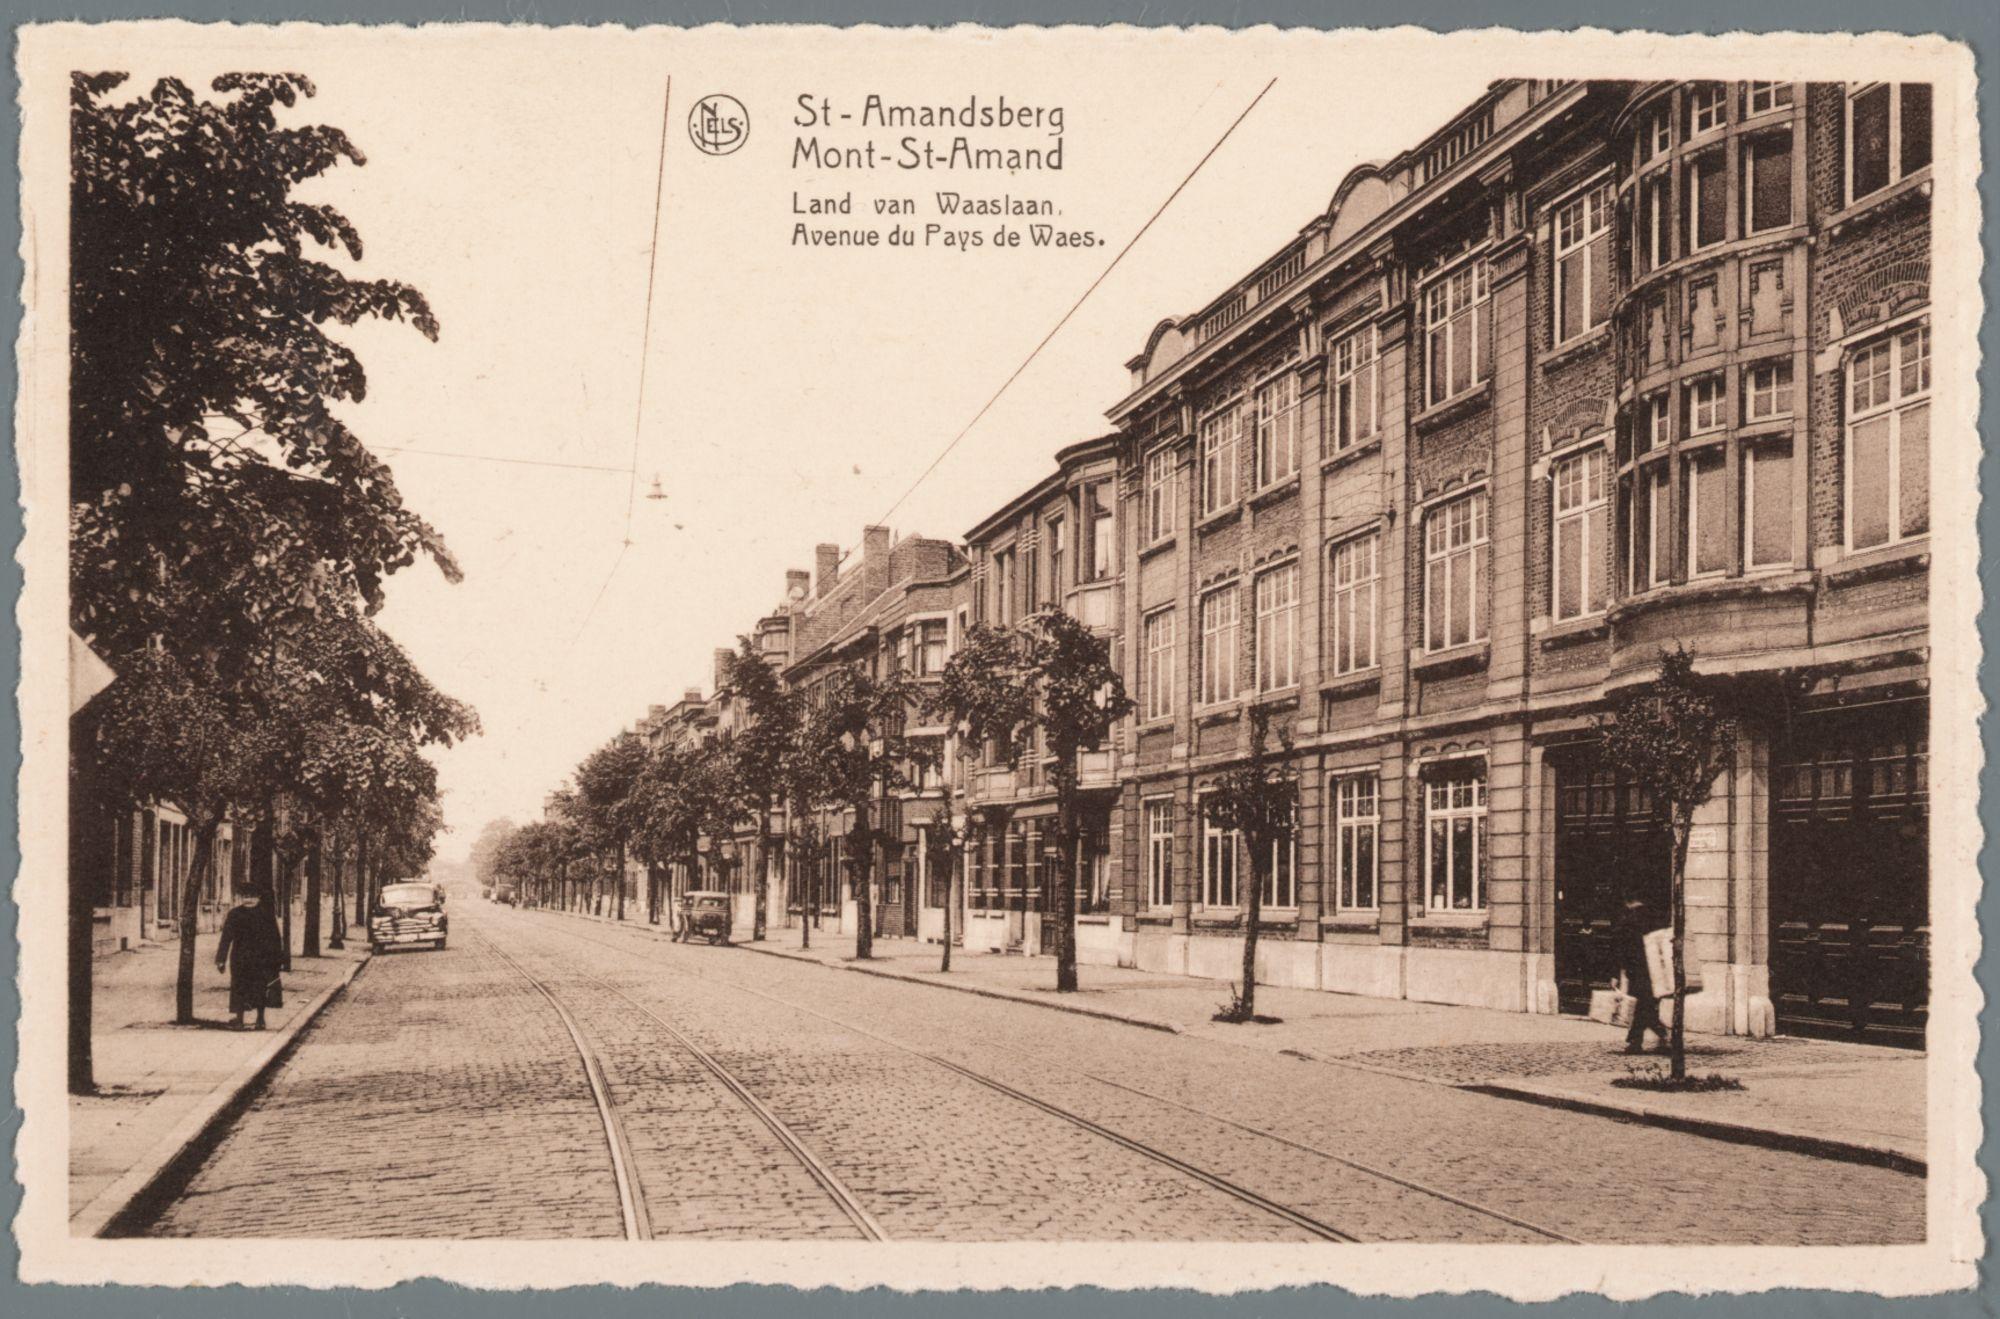 Sint-Amandsberg: Land van Waaslaan